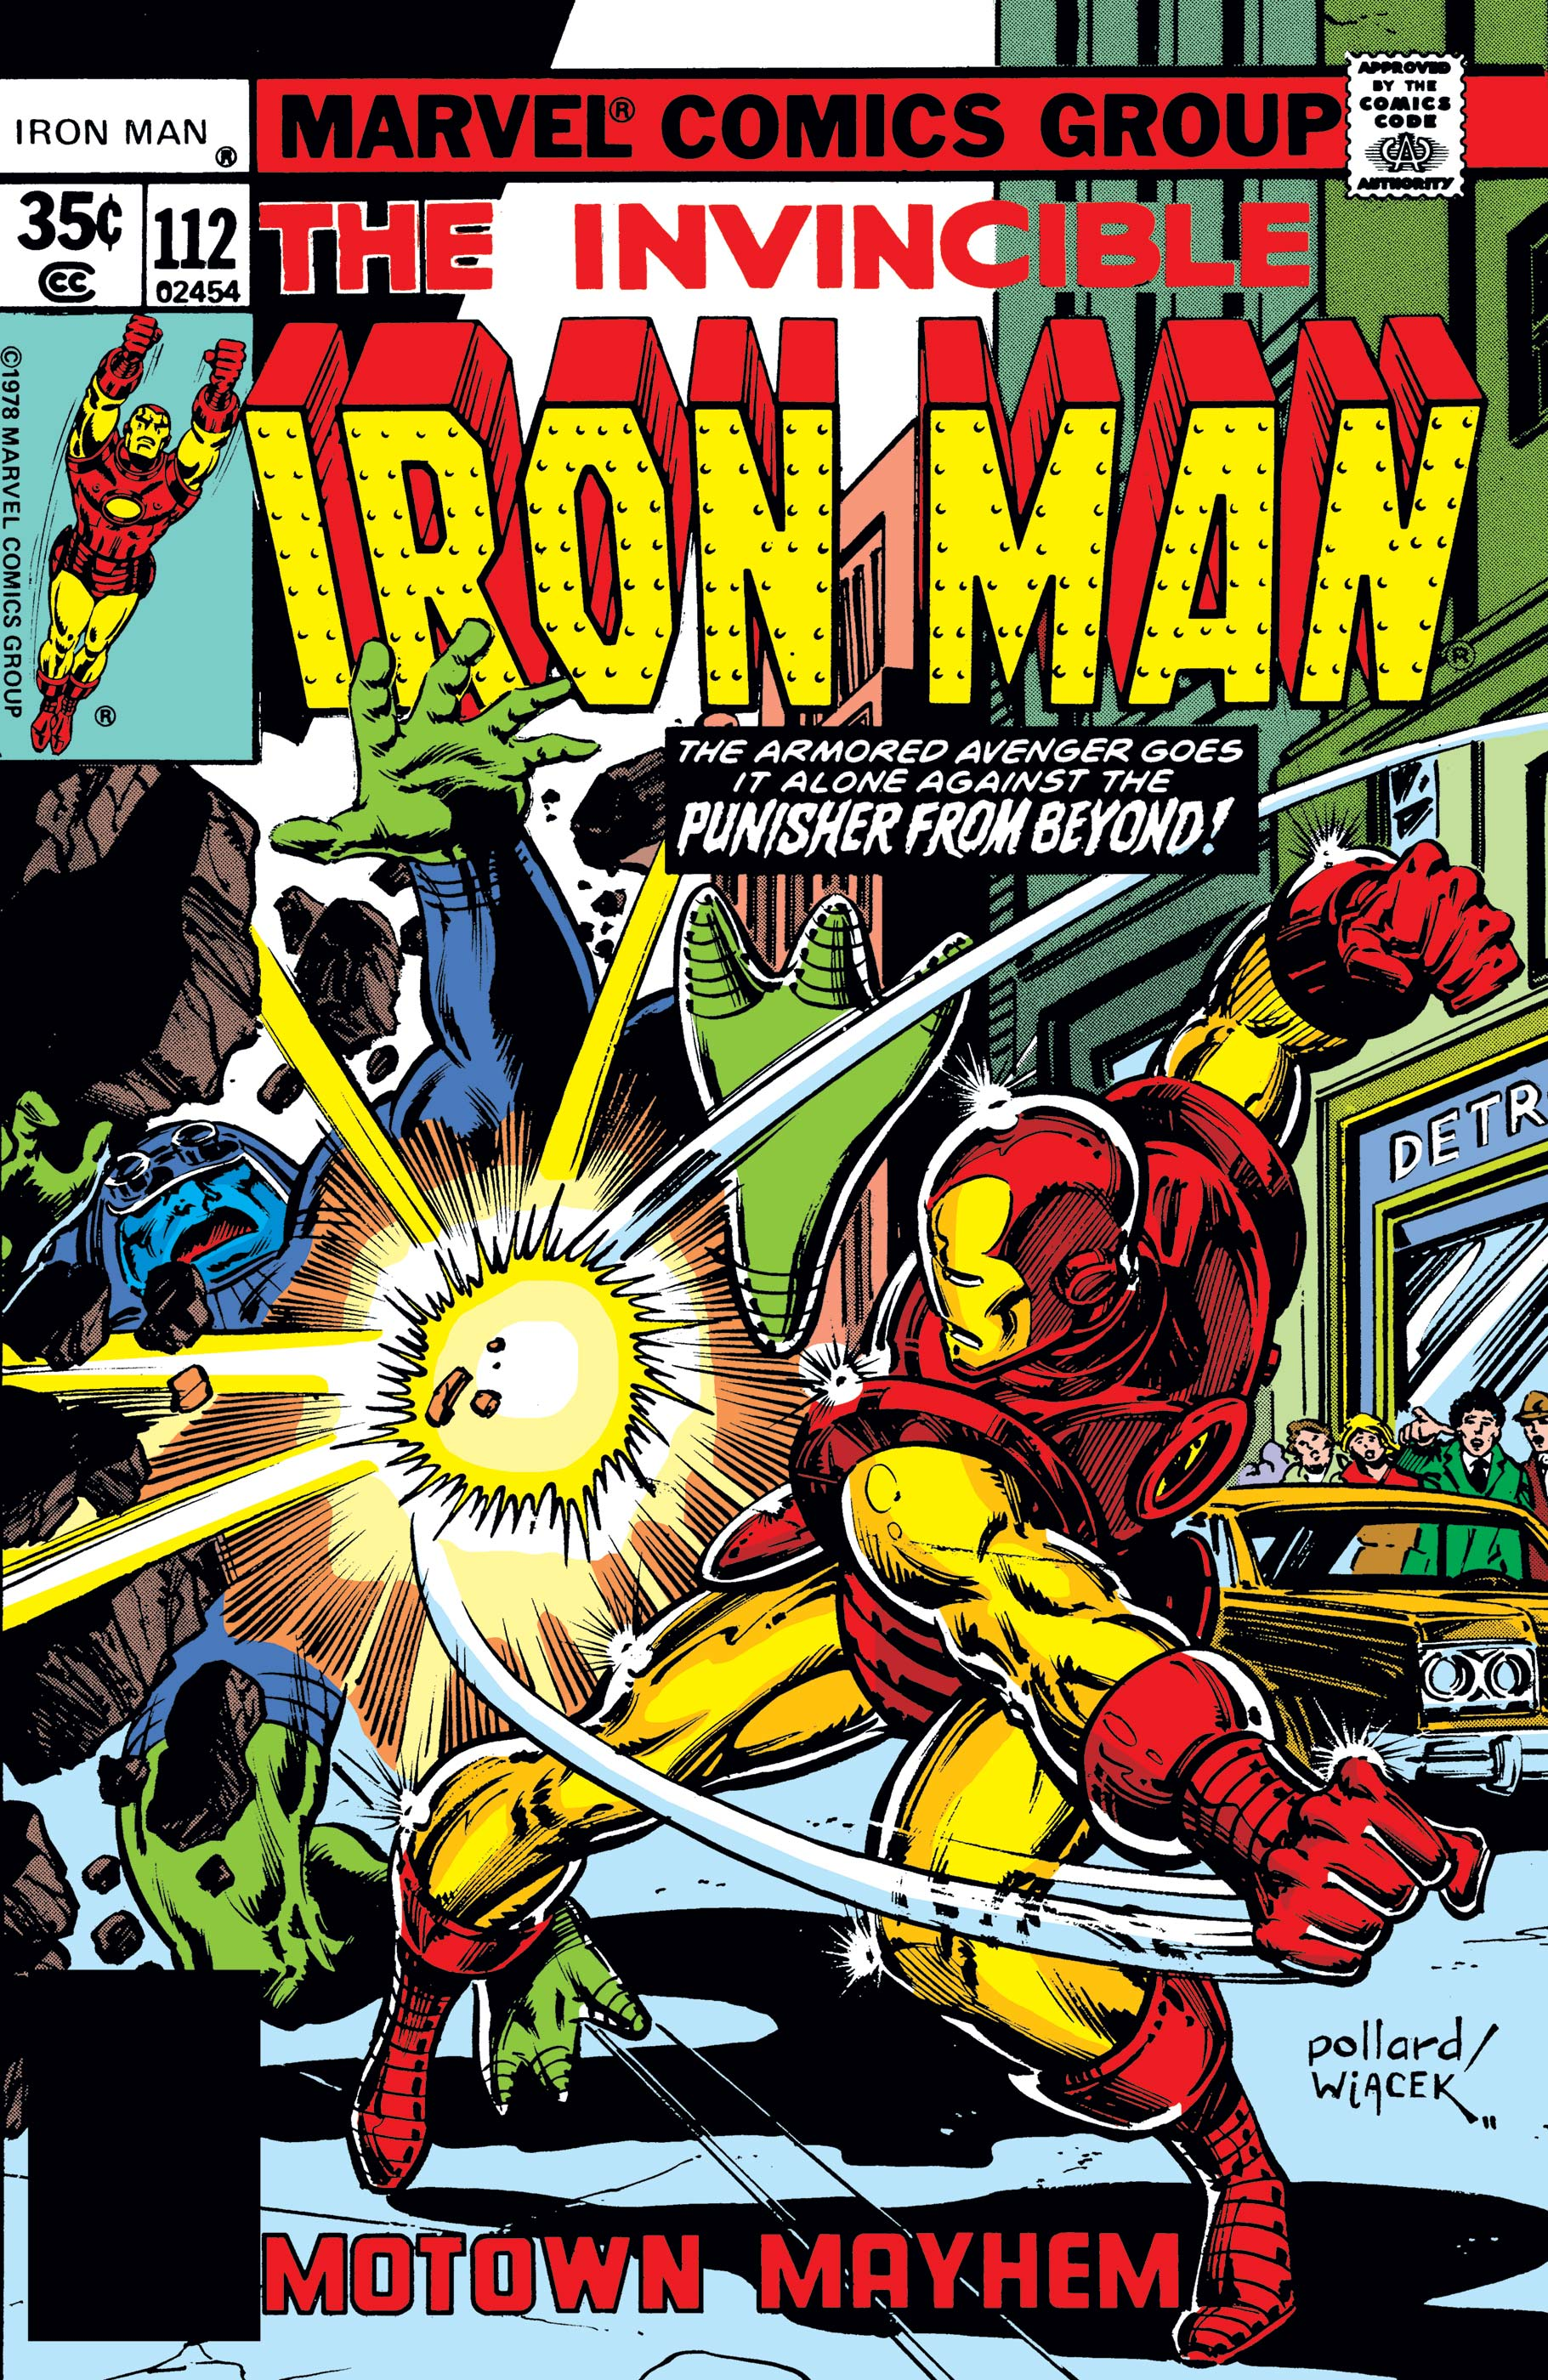 Iron Man (1968) #112